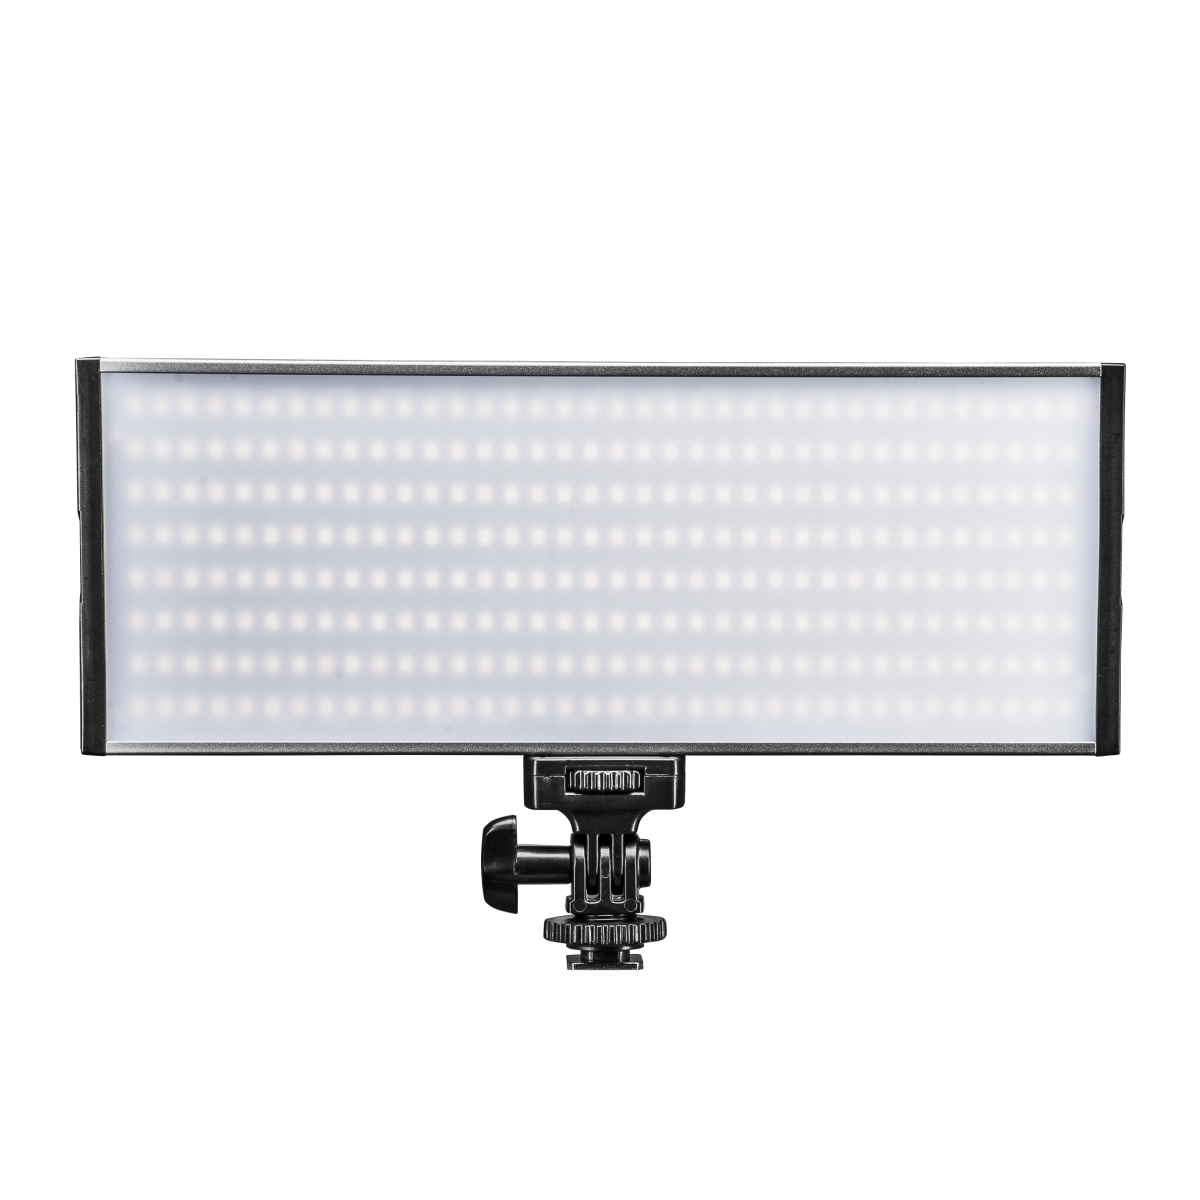 Walimex pro LED Niova 300 Bi Color On Camera LED Leuchte 30 Watt